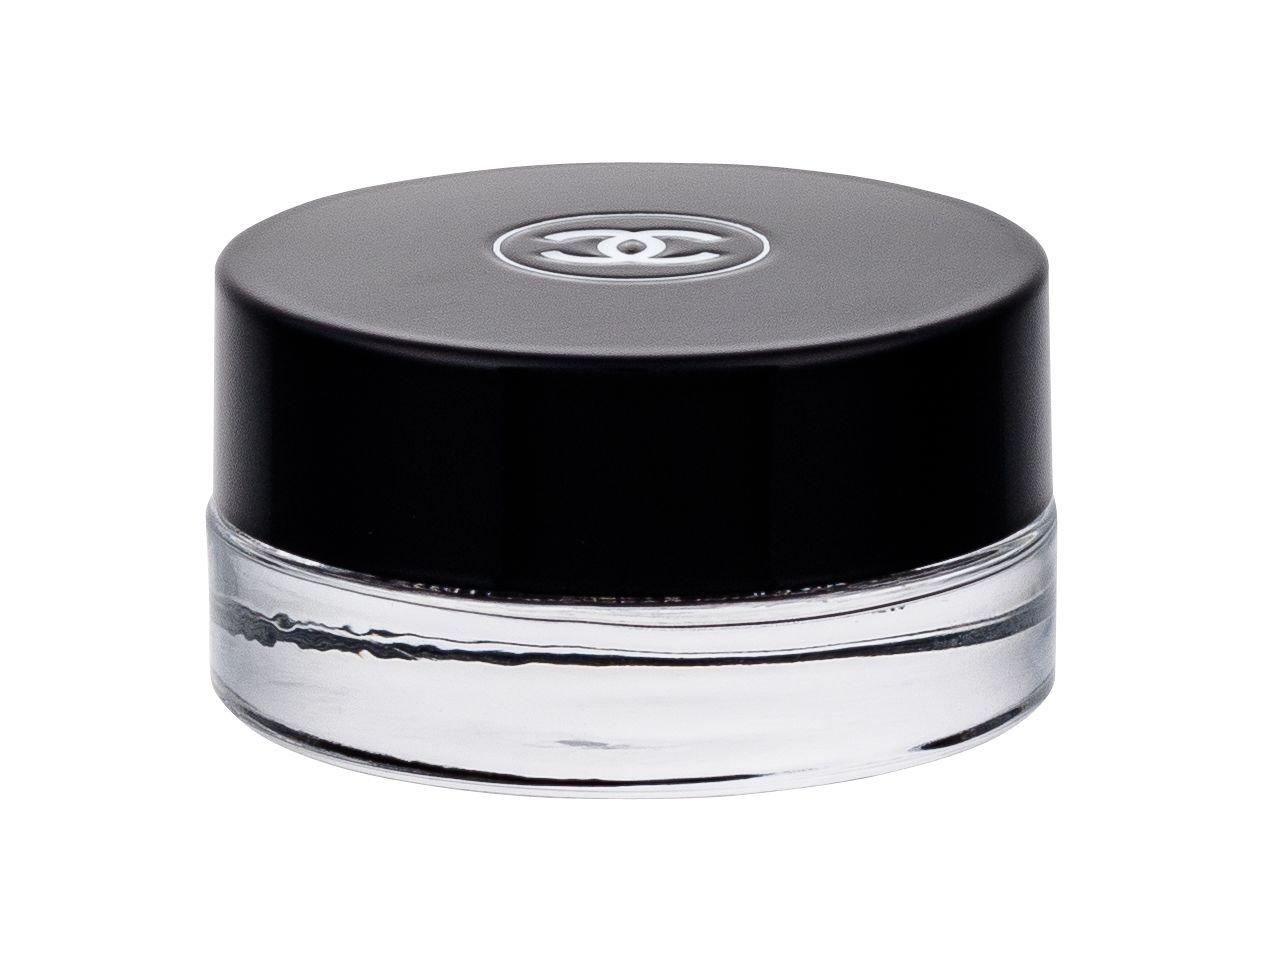 Chanel Calligraphie De Chanel Eye Line 4ml 65 Hyperblack